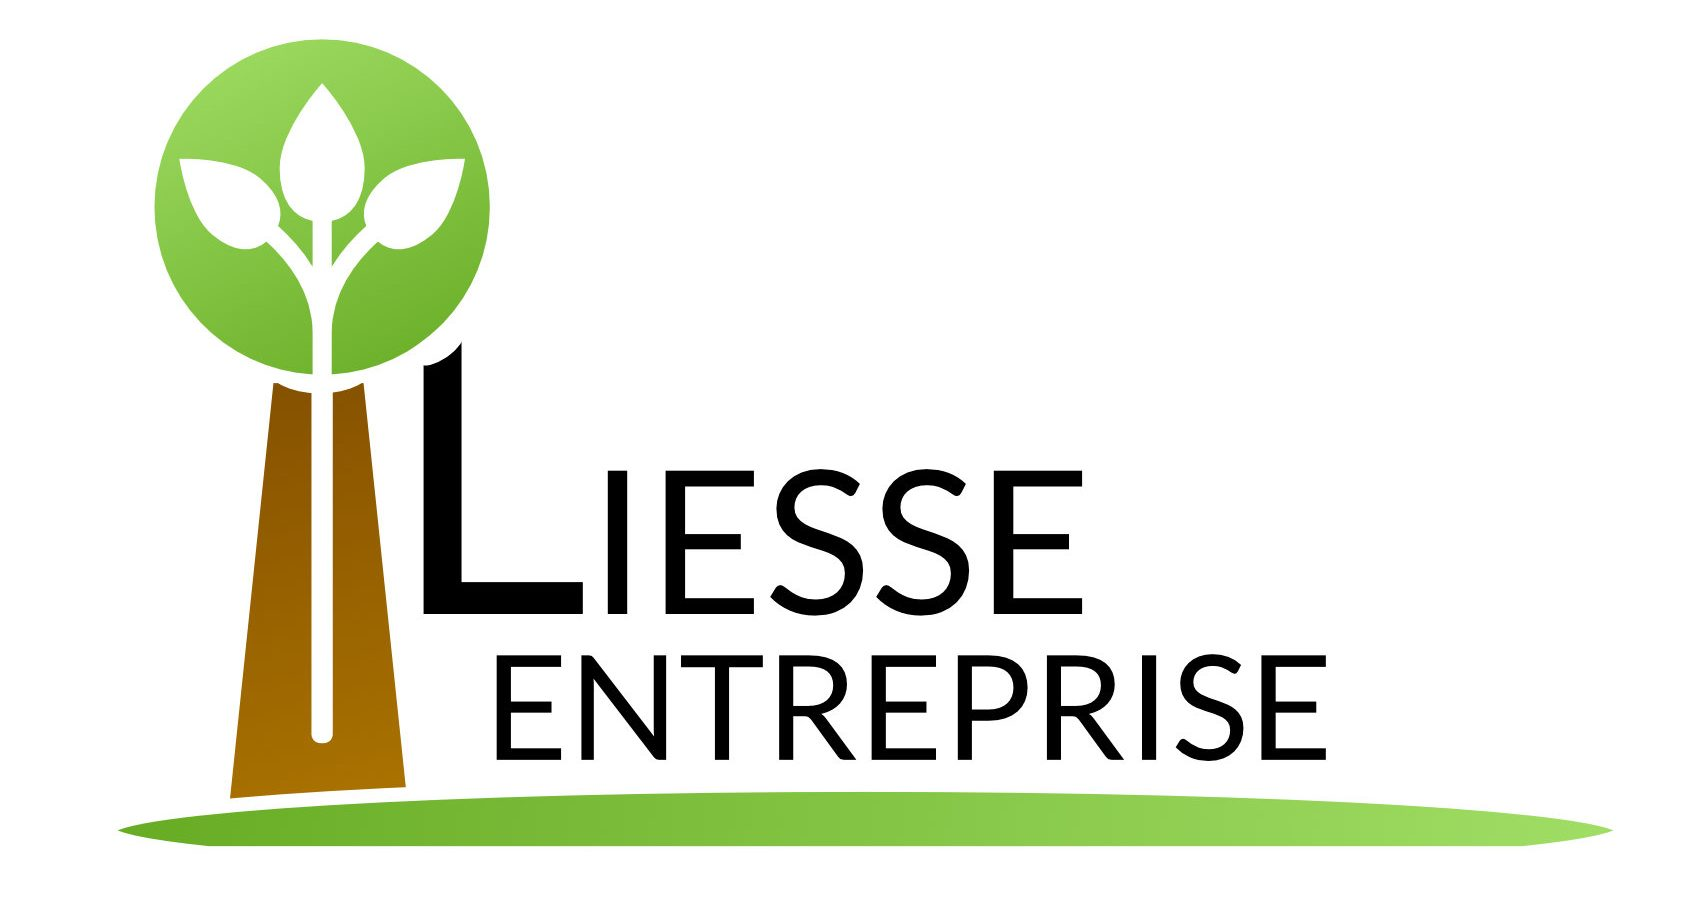 Liesse Entreprise